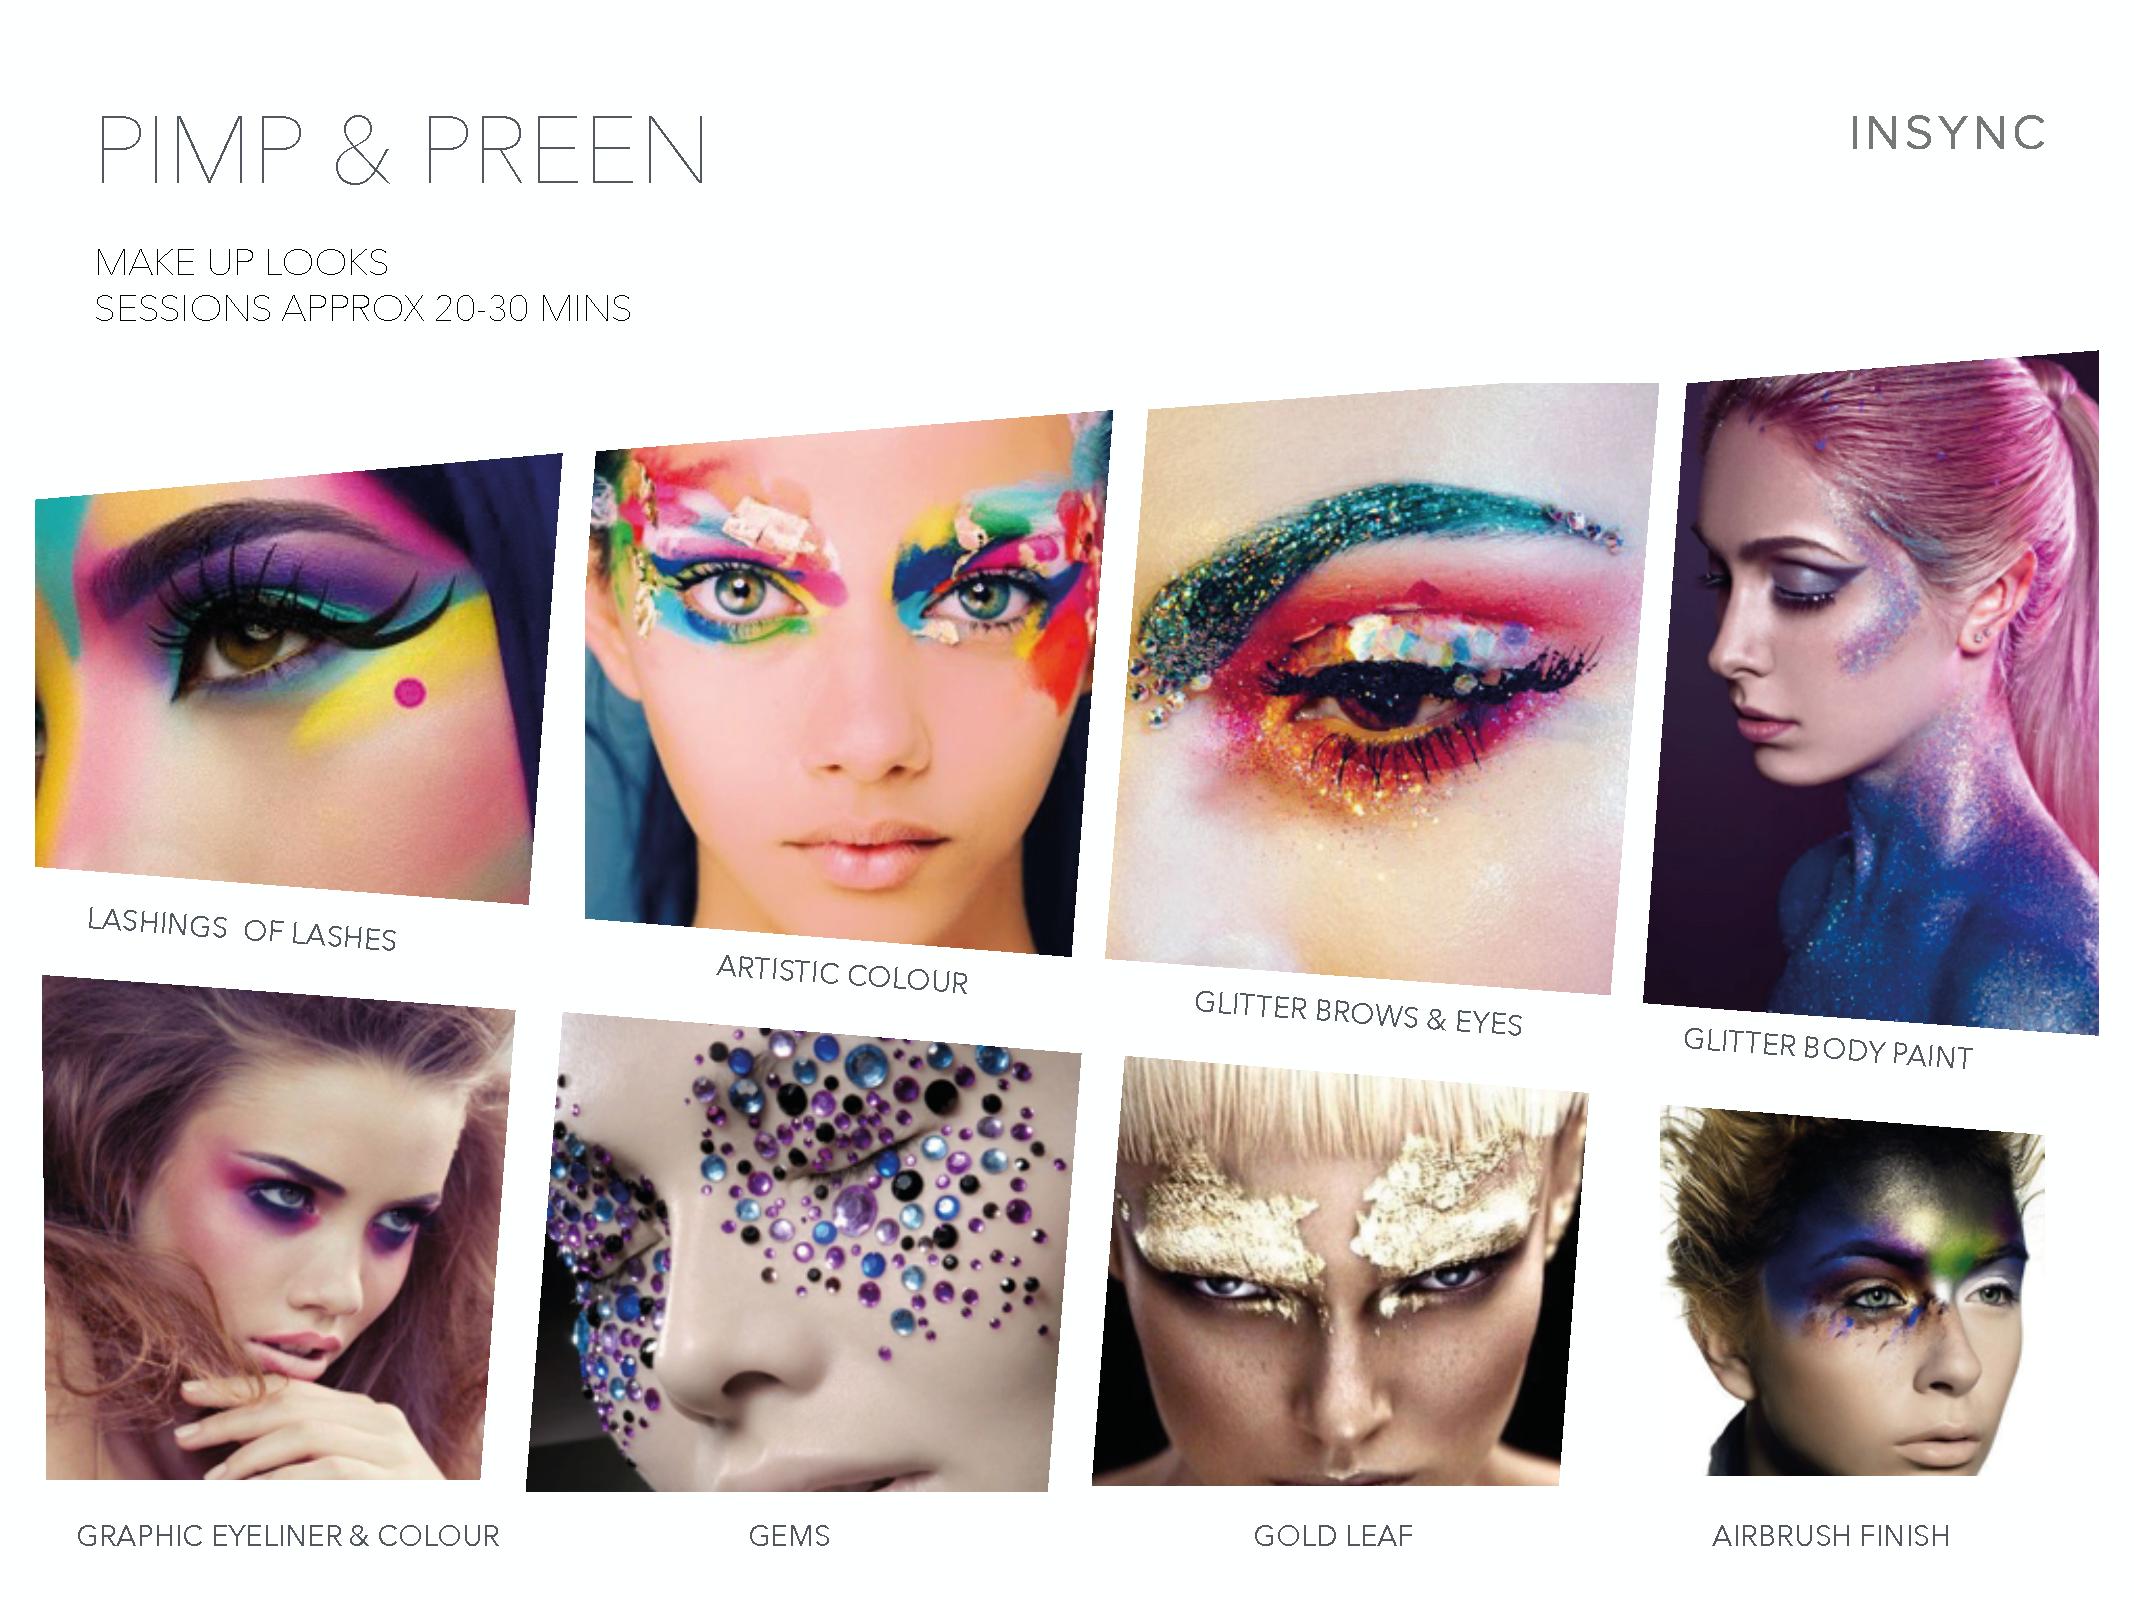 Pimp & Preen_Page_05.png